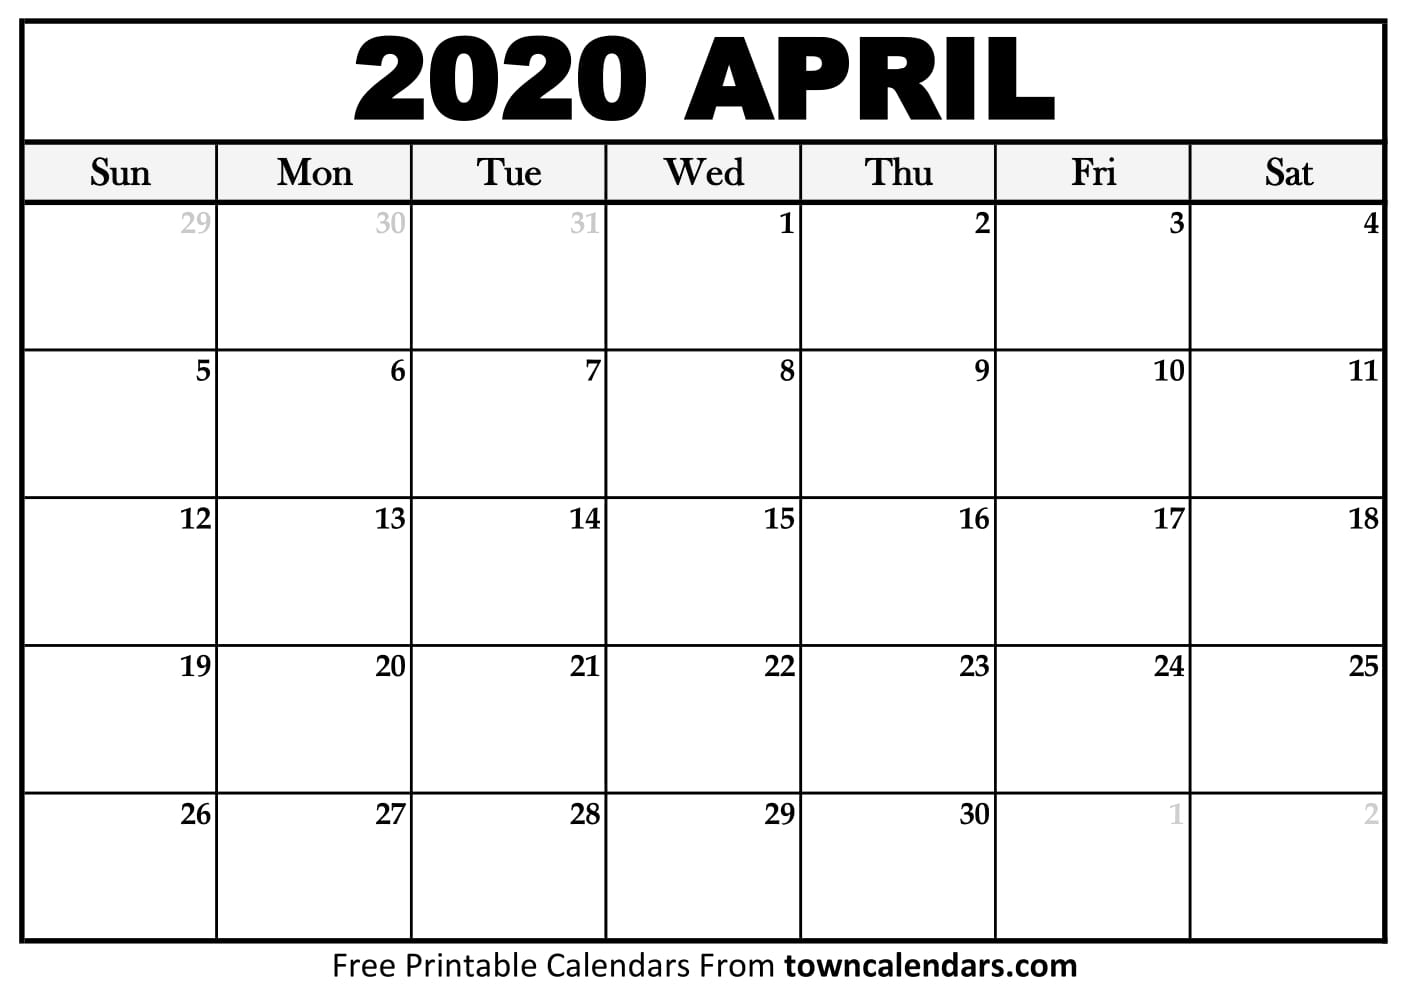 Printable April 2020 Calendar - Towncalendars